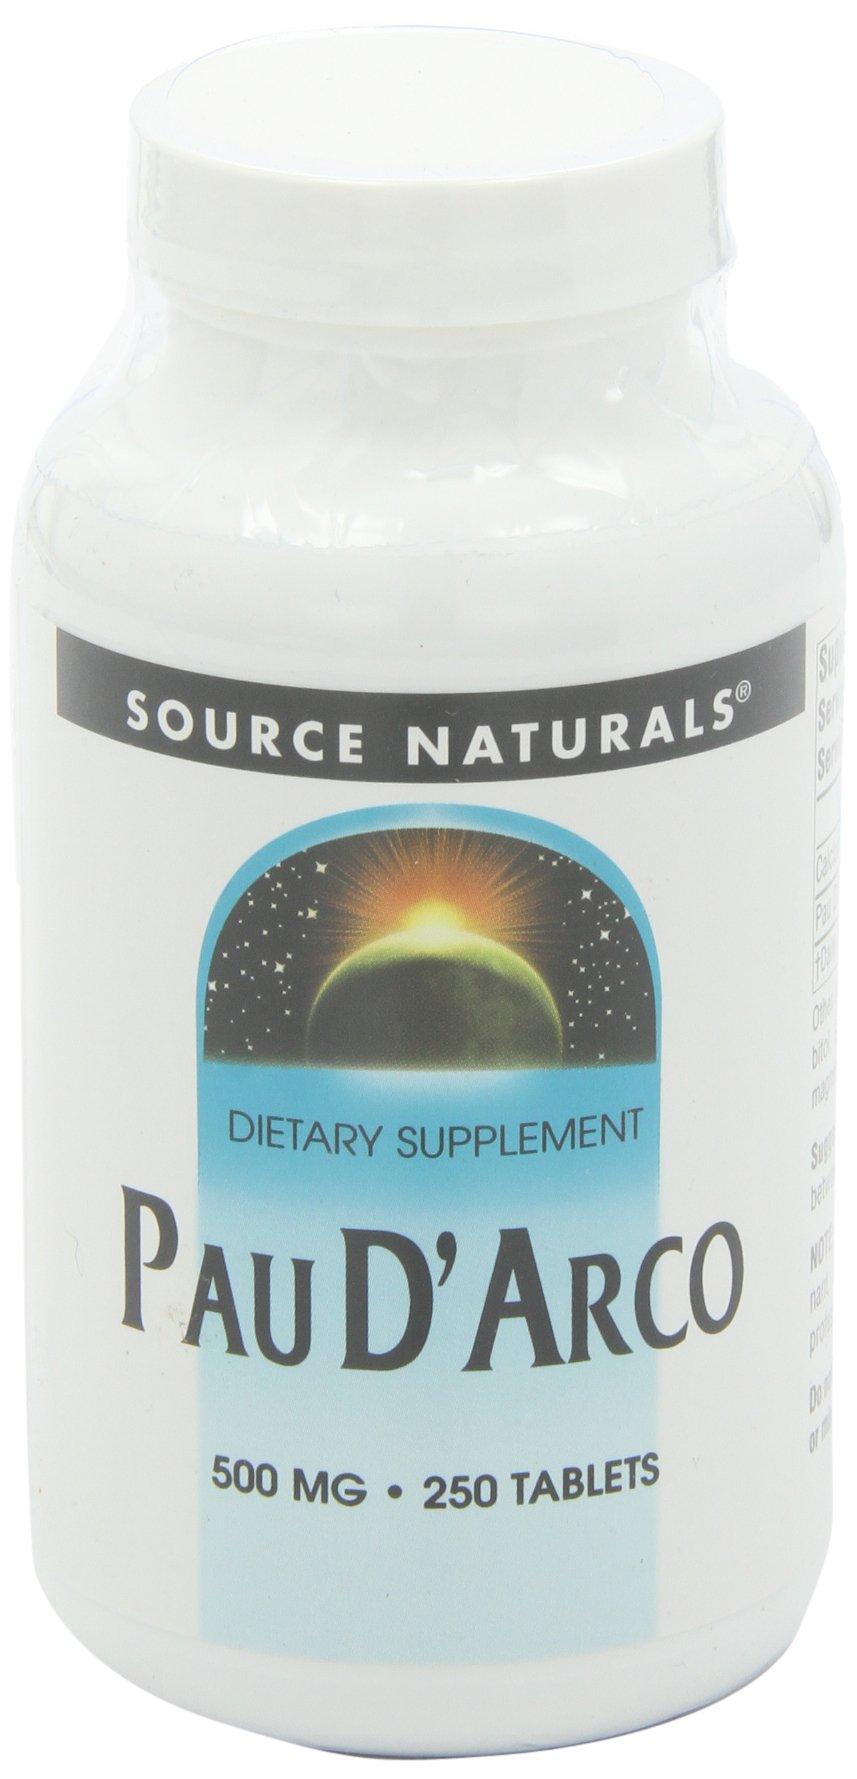 Source Naturals Pau D'Arco, 500mg, 250 Tablets